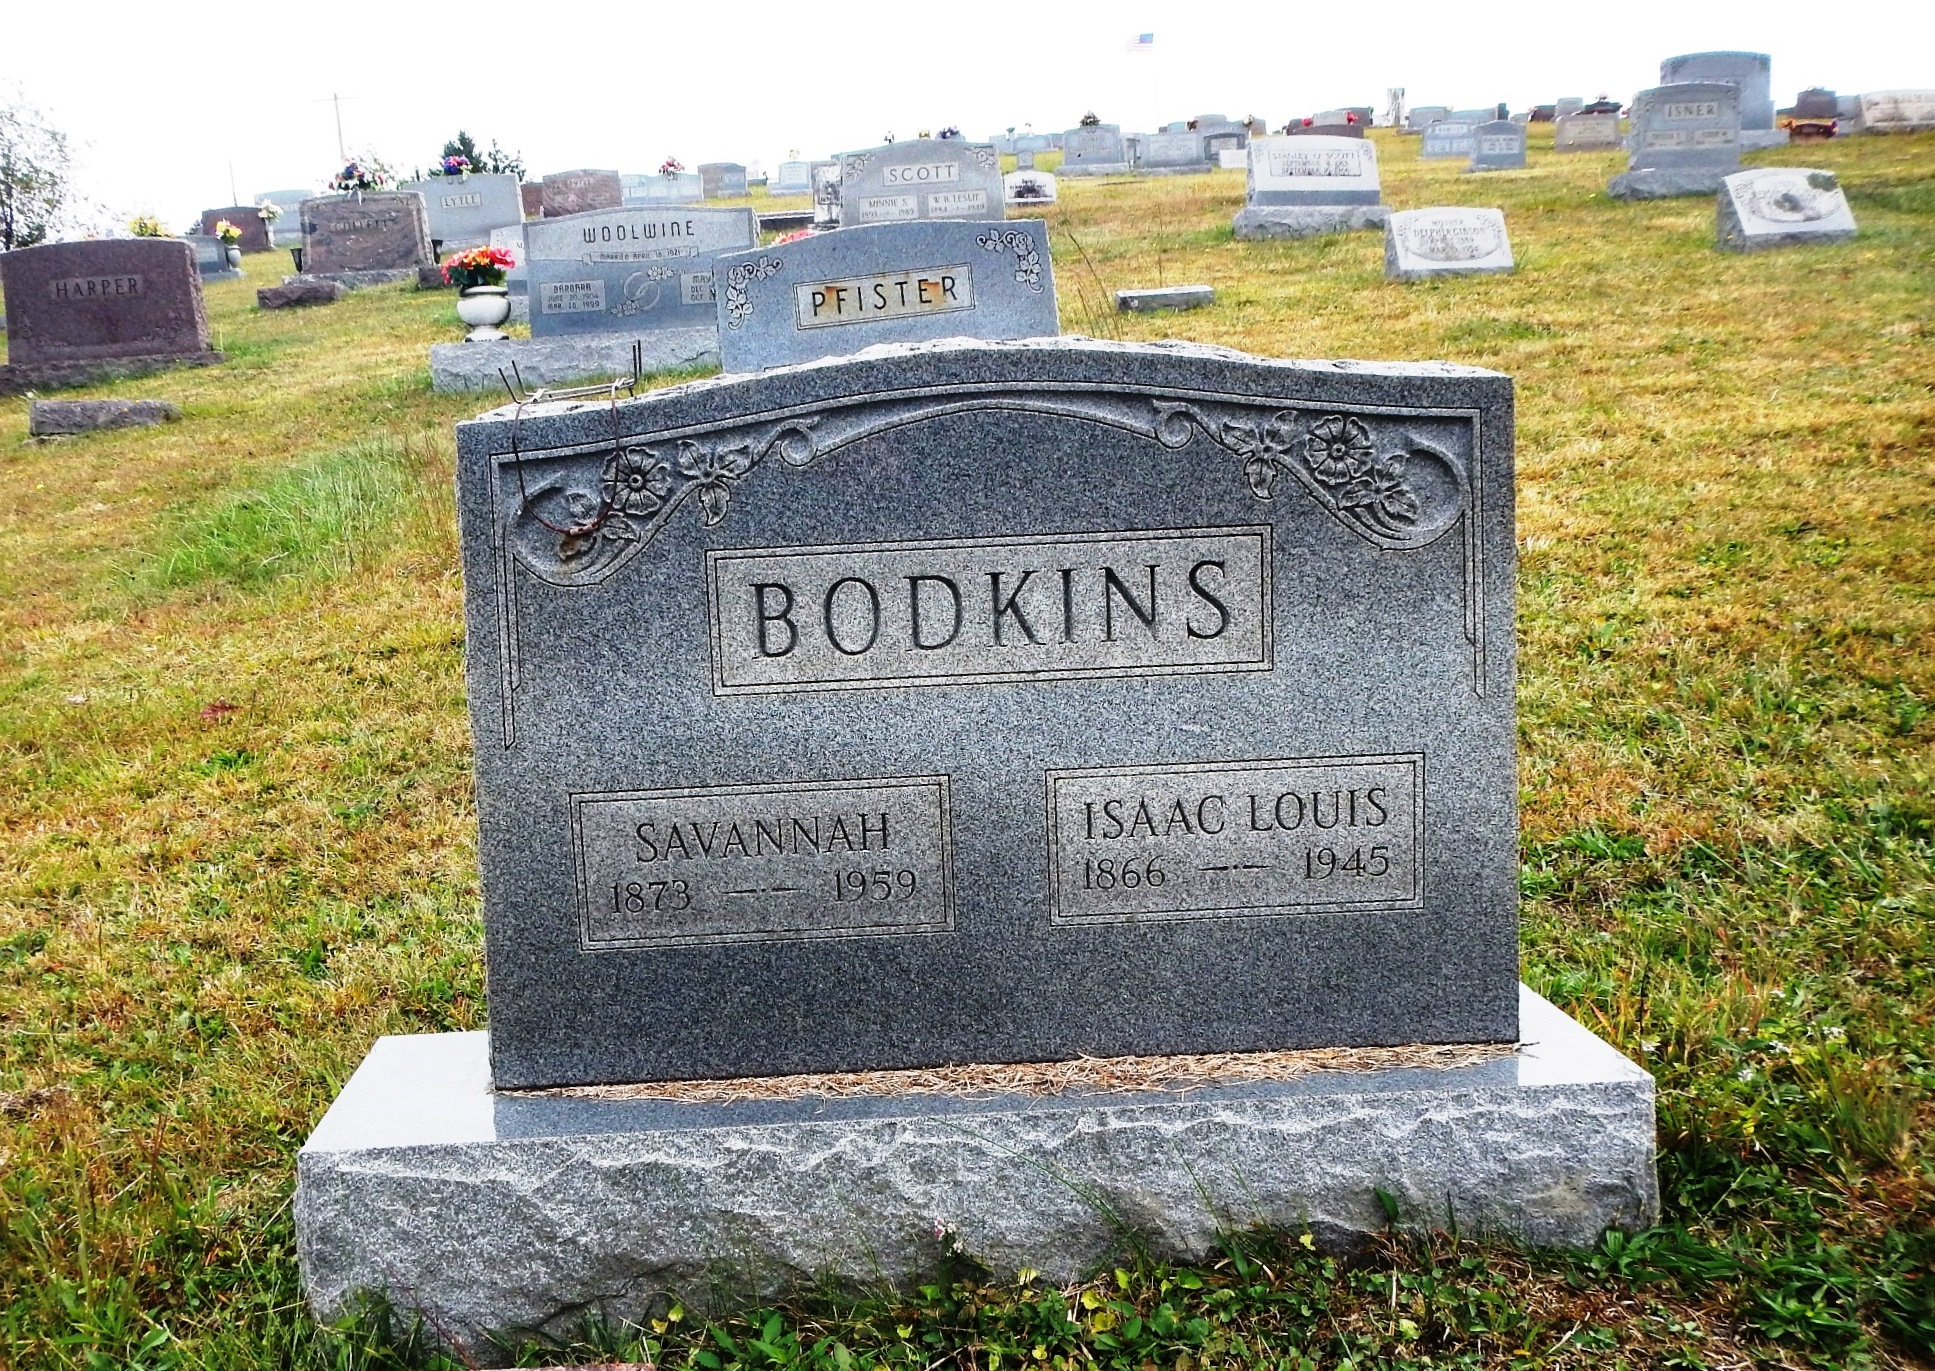 Isaac Louis Bodkins